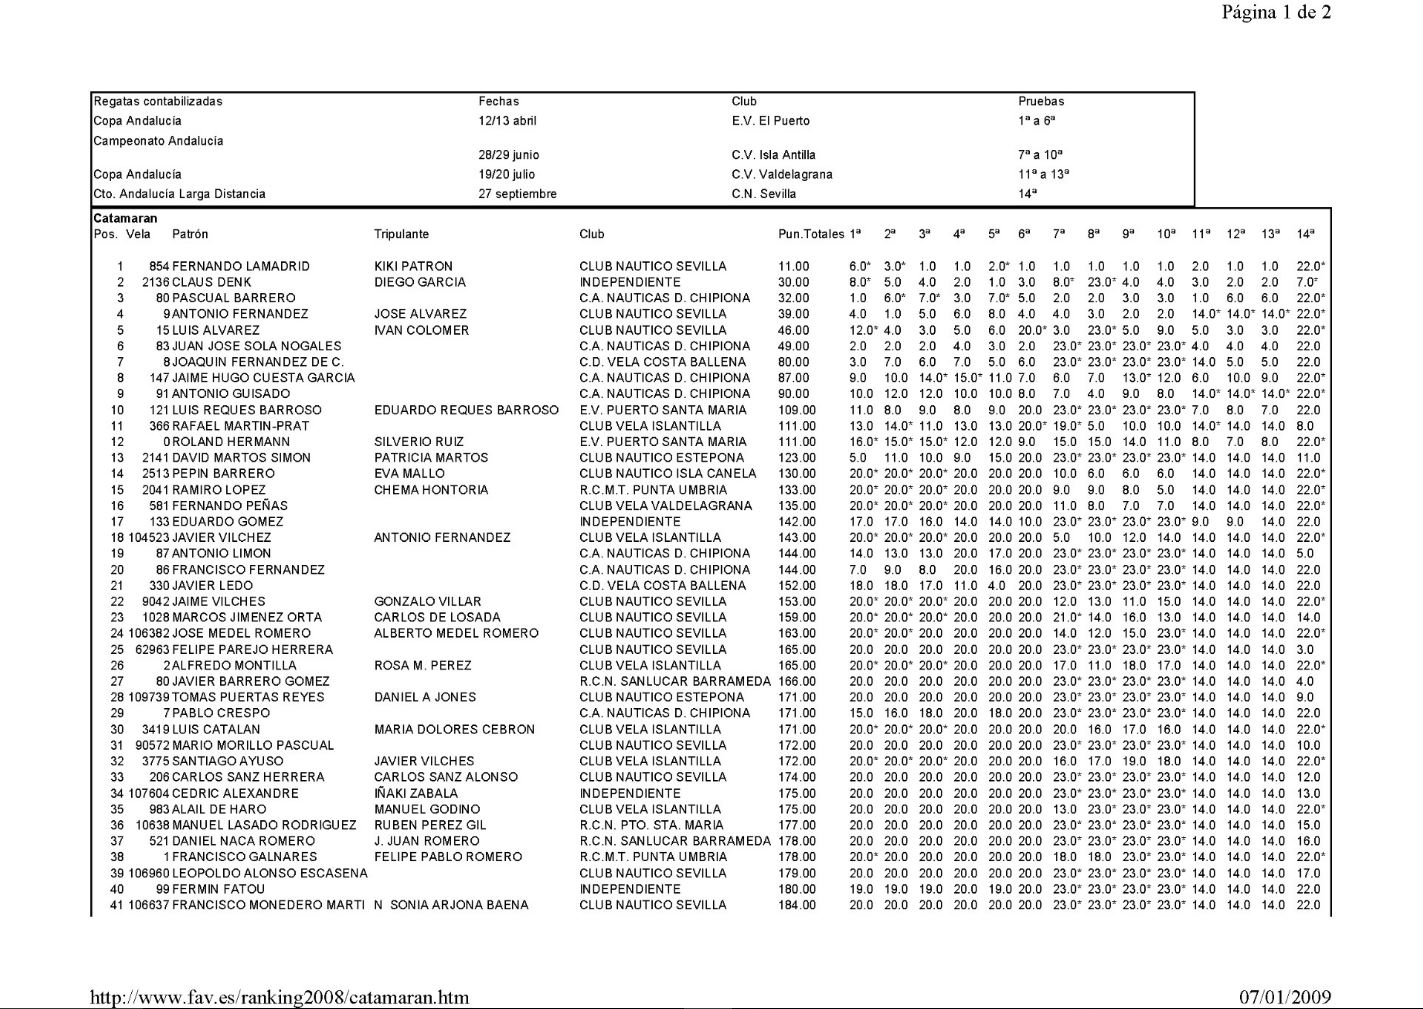 Ranking 2008